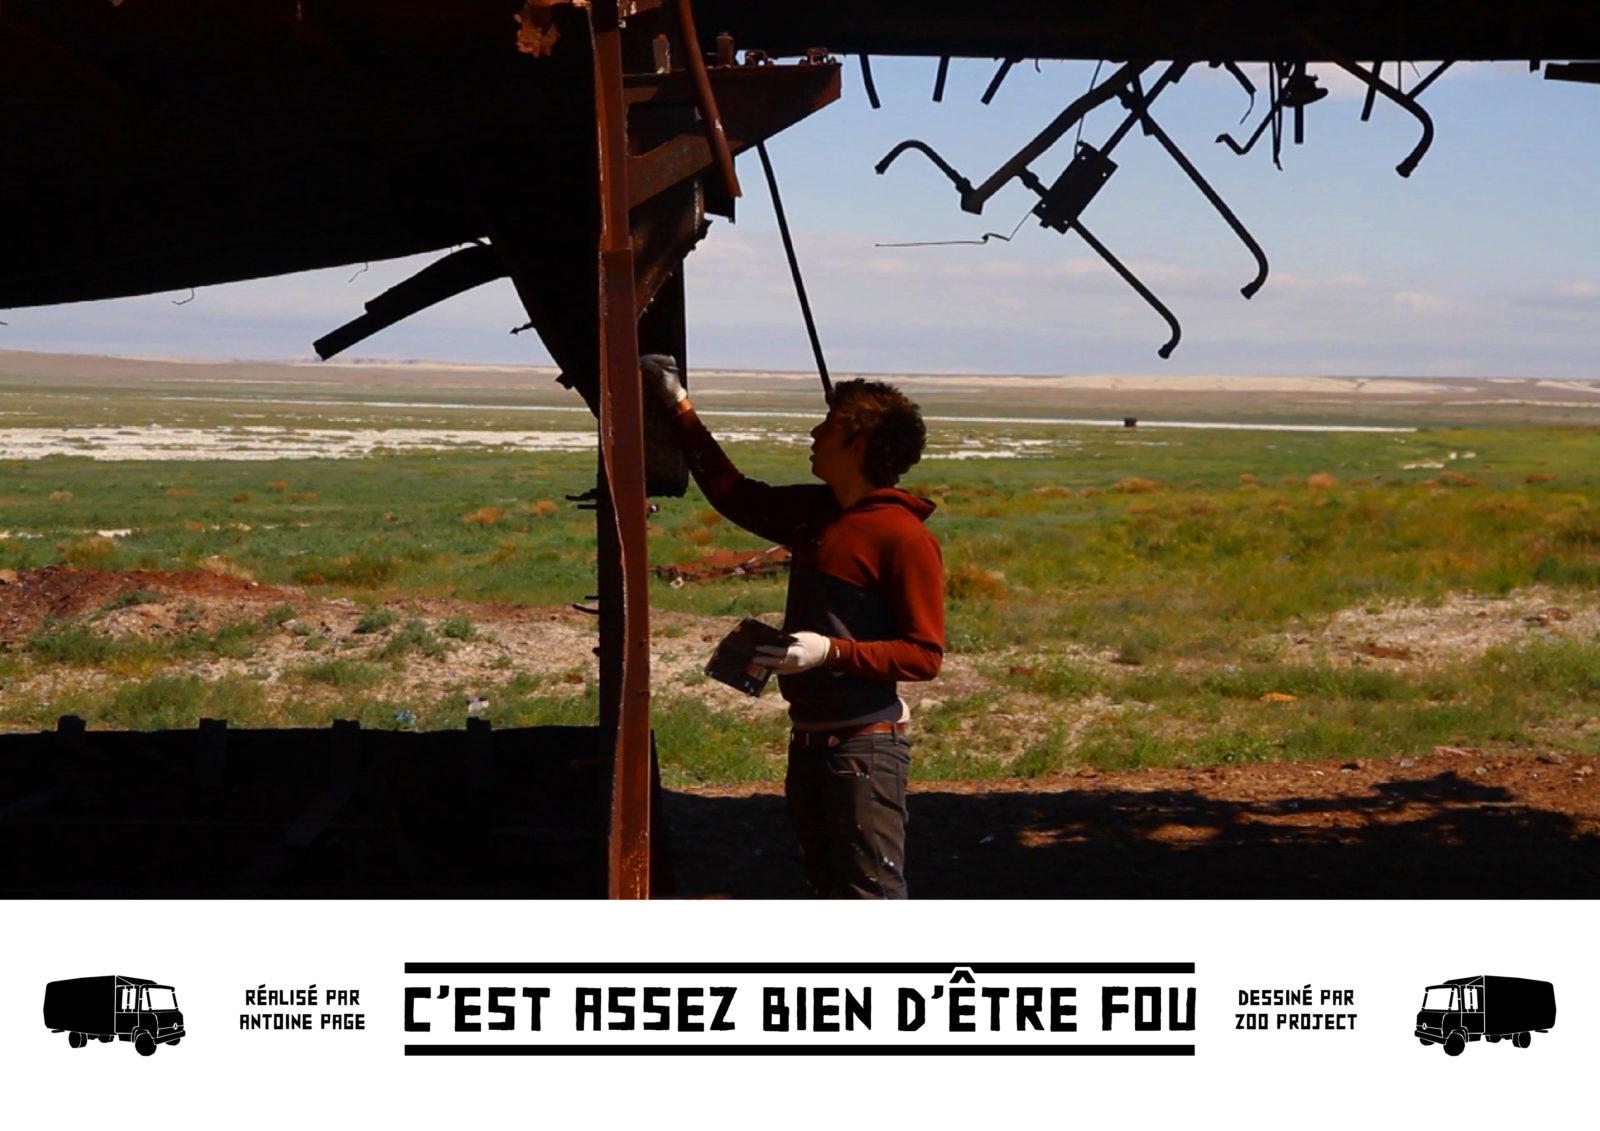 zoo project documentaire antoine page - Le documentaire-hommage au street artiste Zoo Project enfin au cinéma